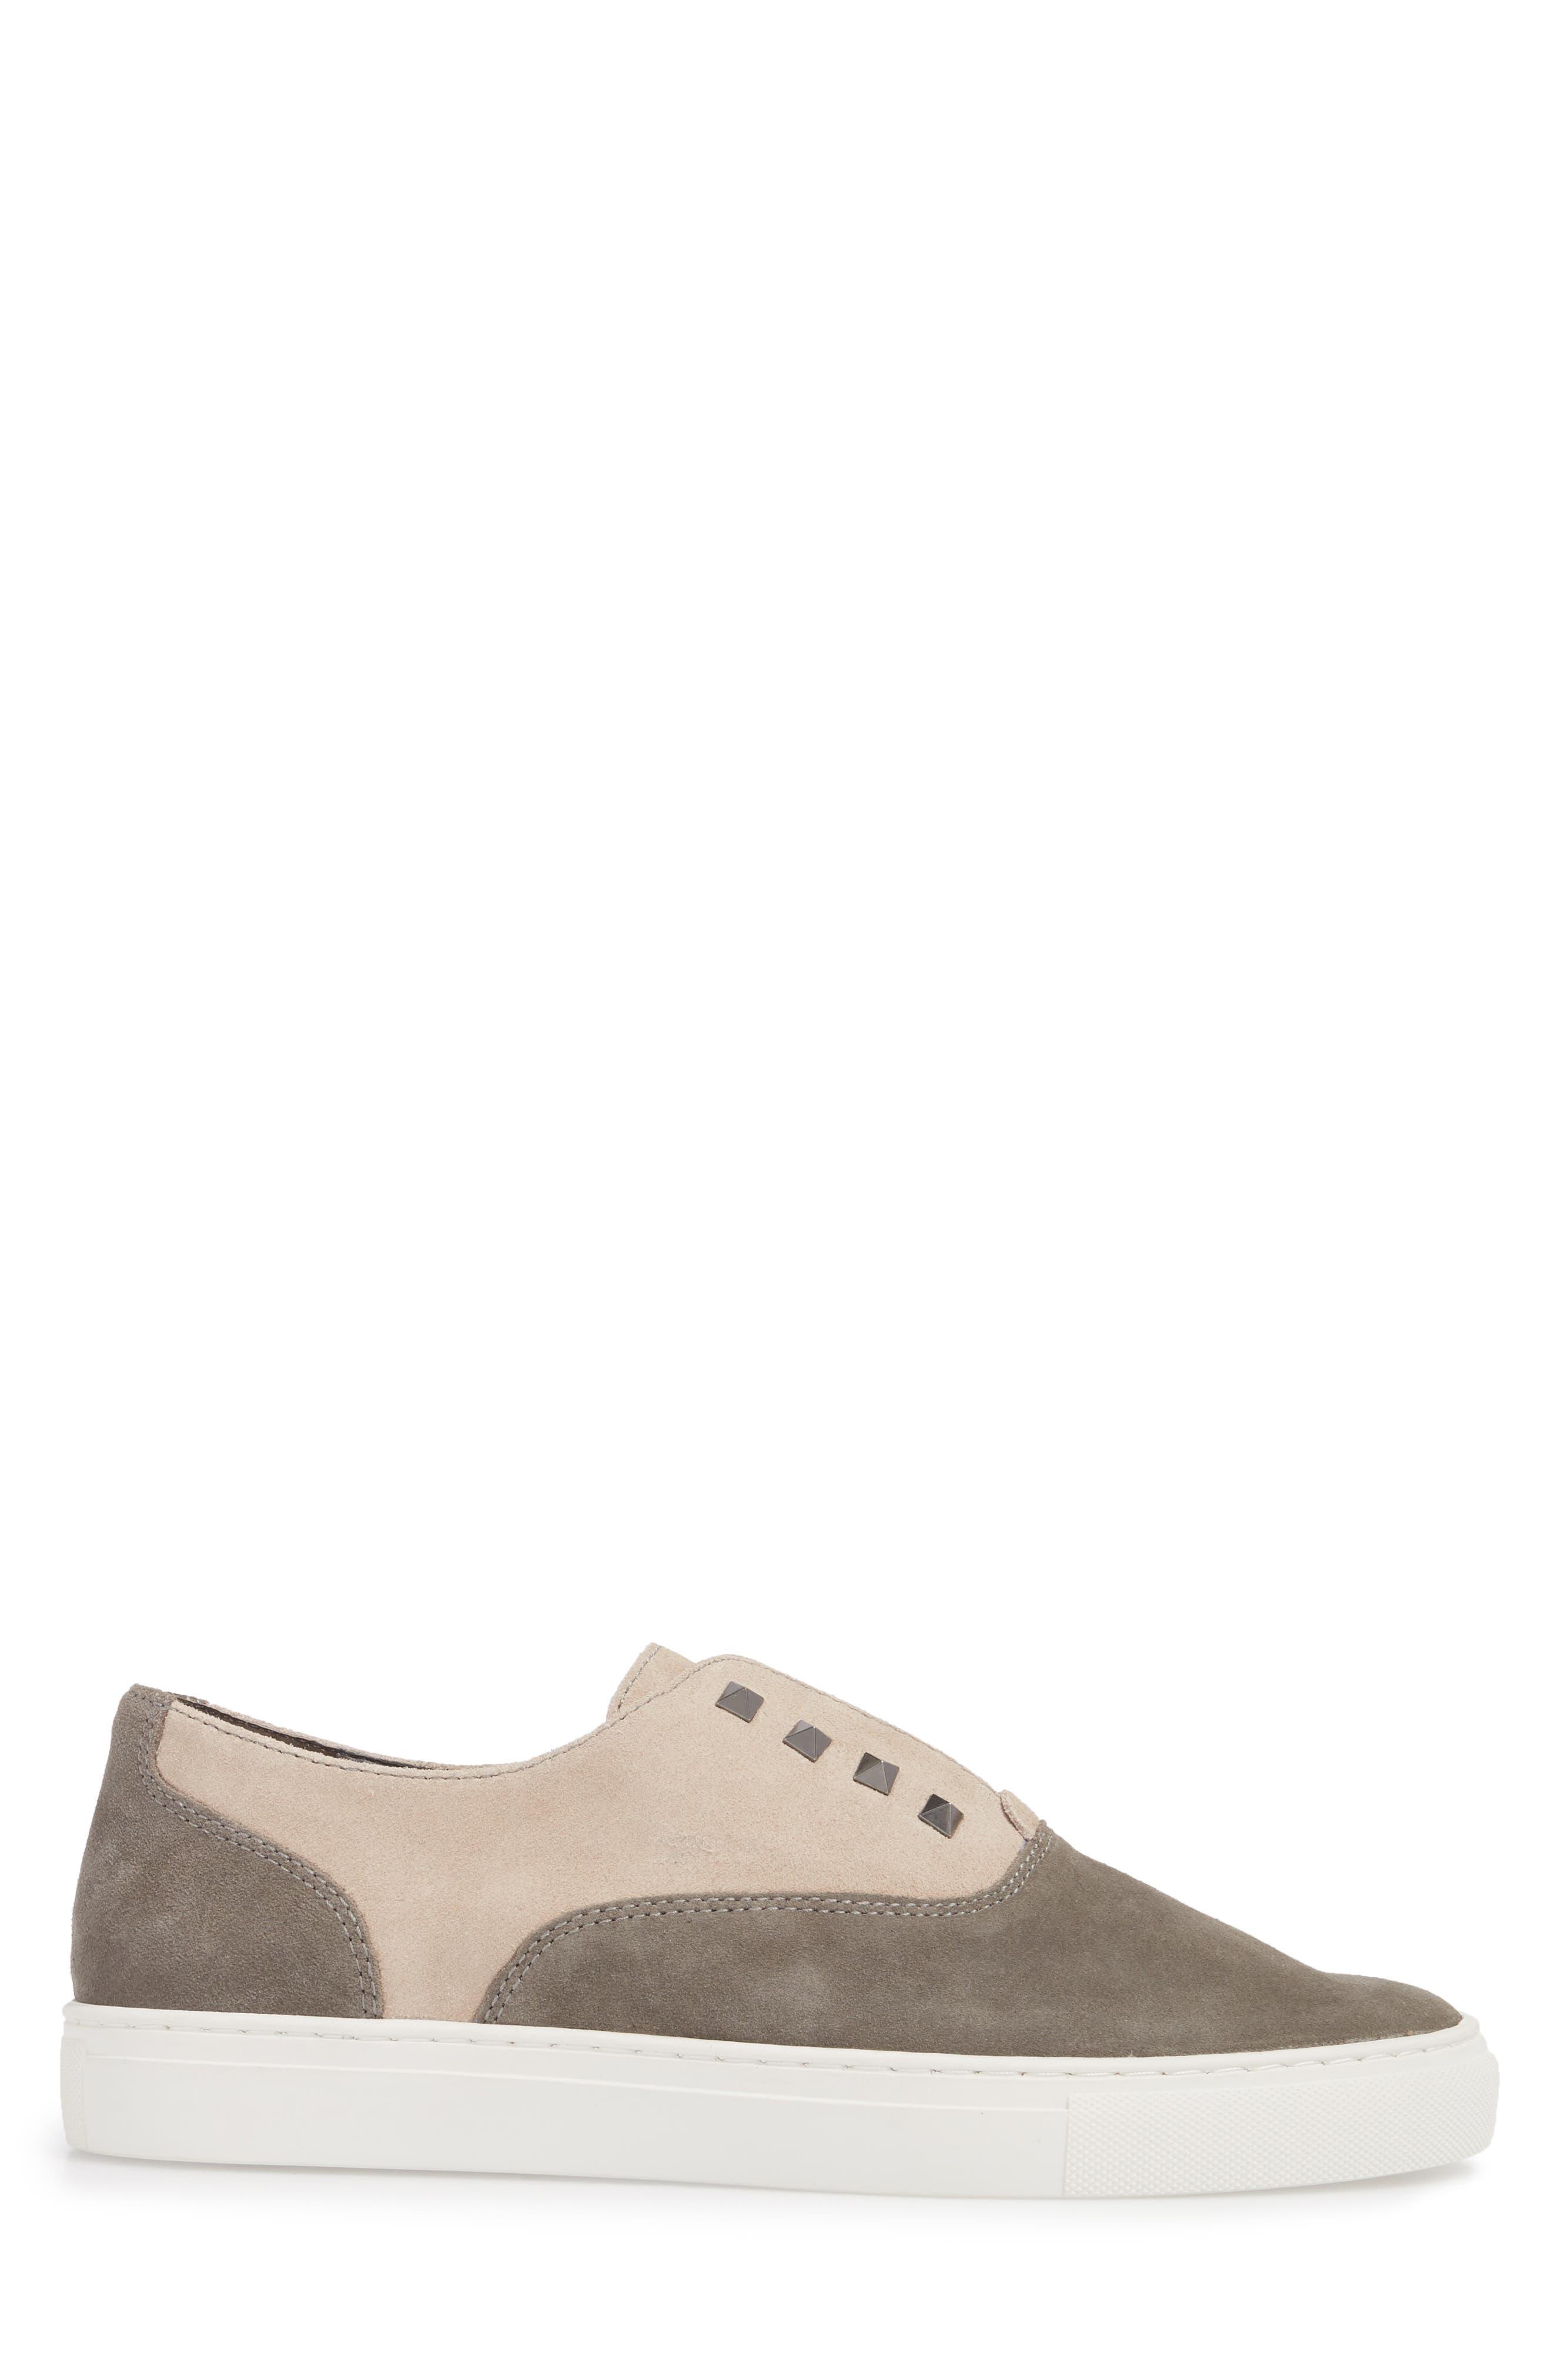 Aryo Studded Laceless Sneaker,                             Alternate thumbnail 6, color,